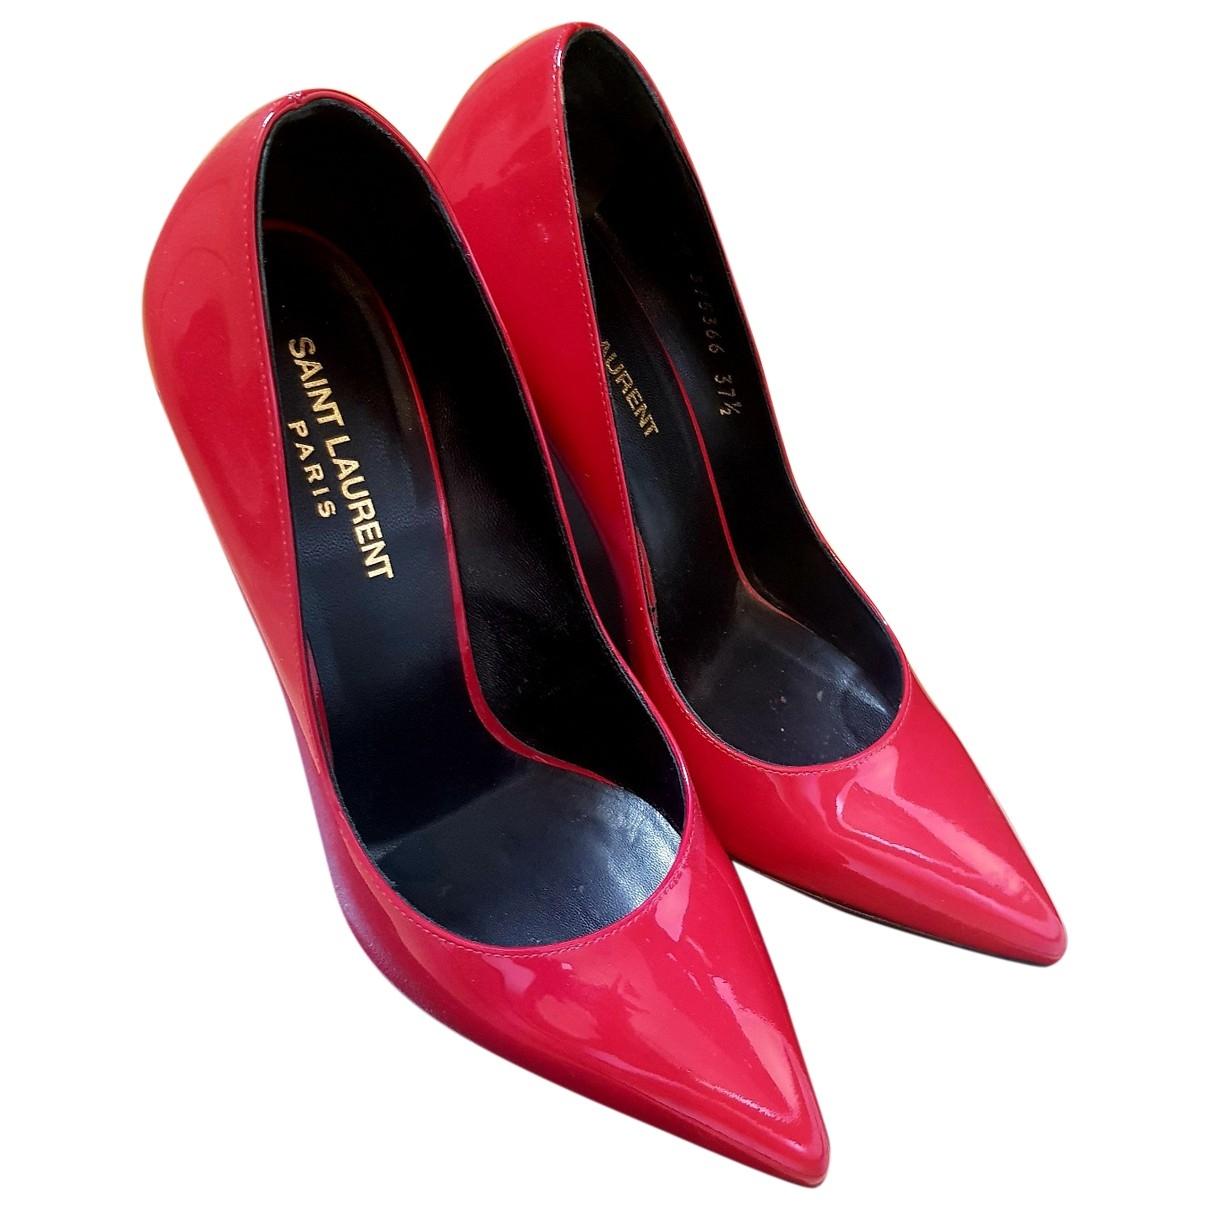 Saint Laurent \N Red Patent leather Heels for Women 37.5 EU